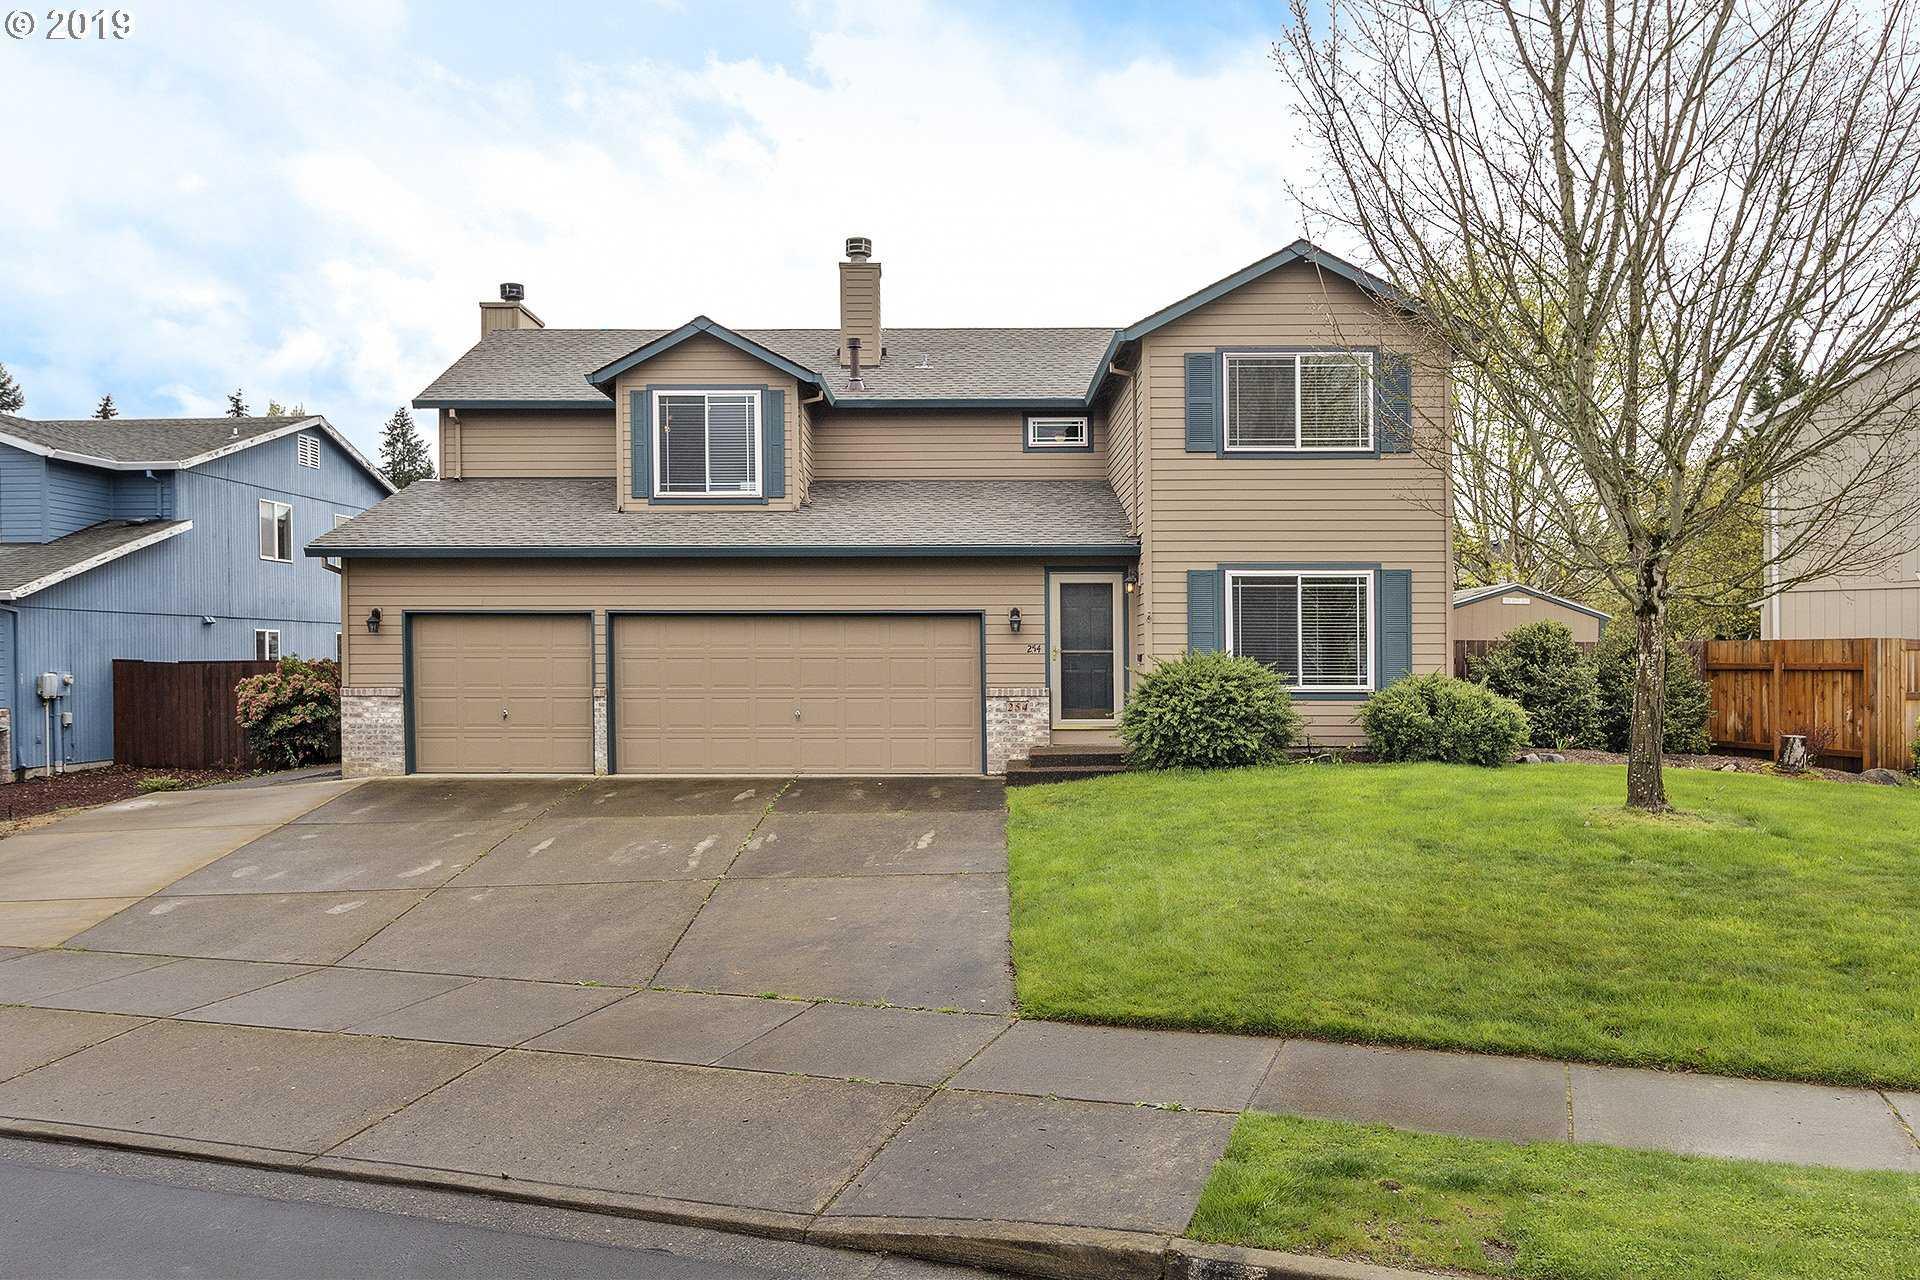 $485,000 - 4Br/3Ba -  for Sale in Hillsboro